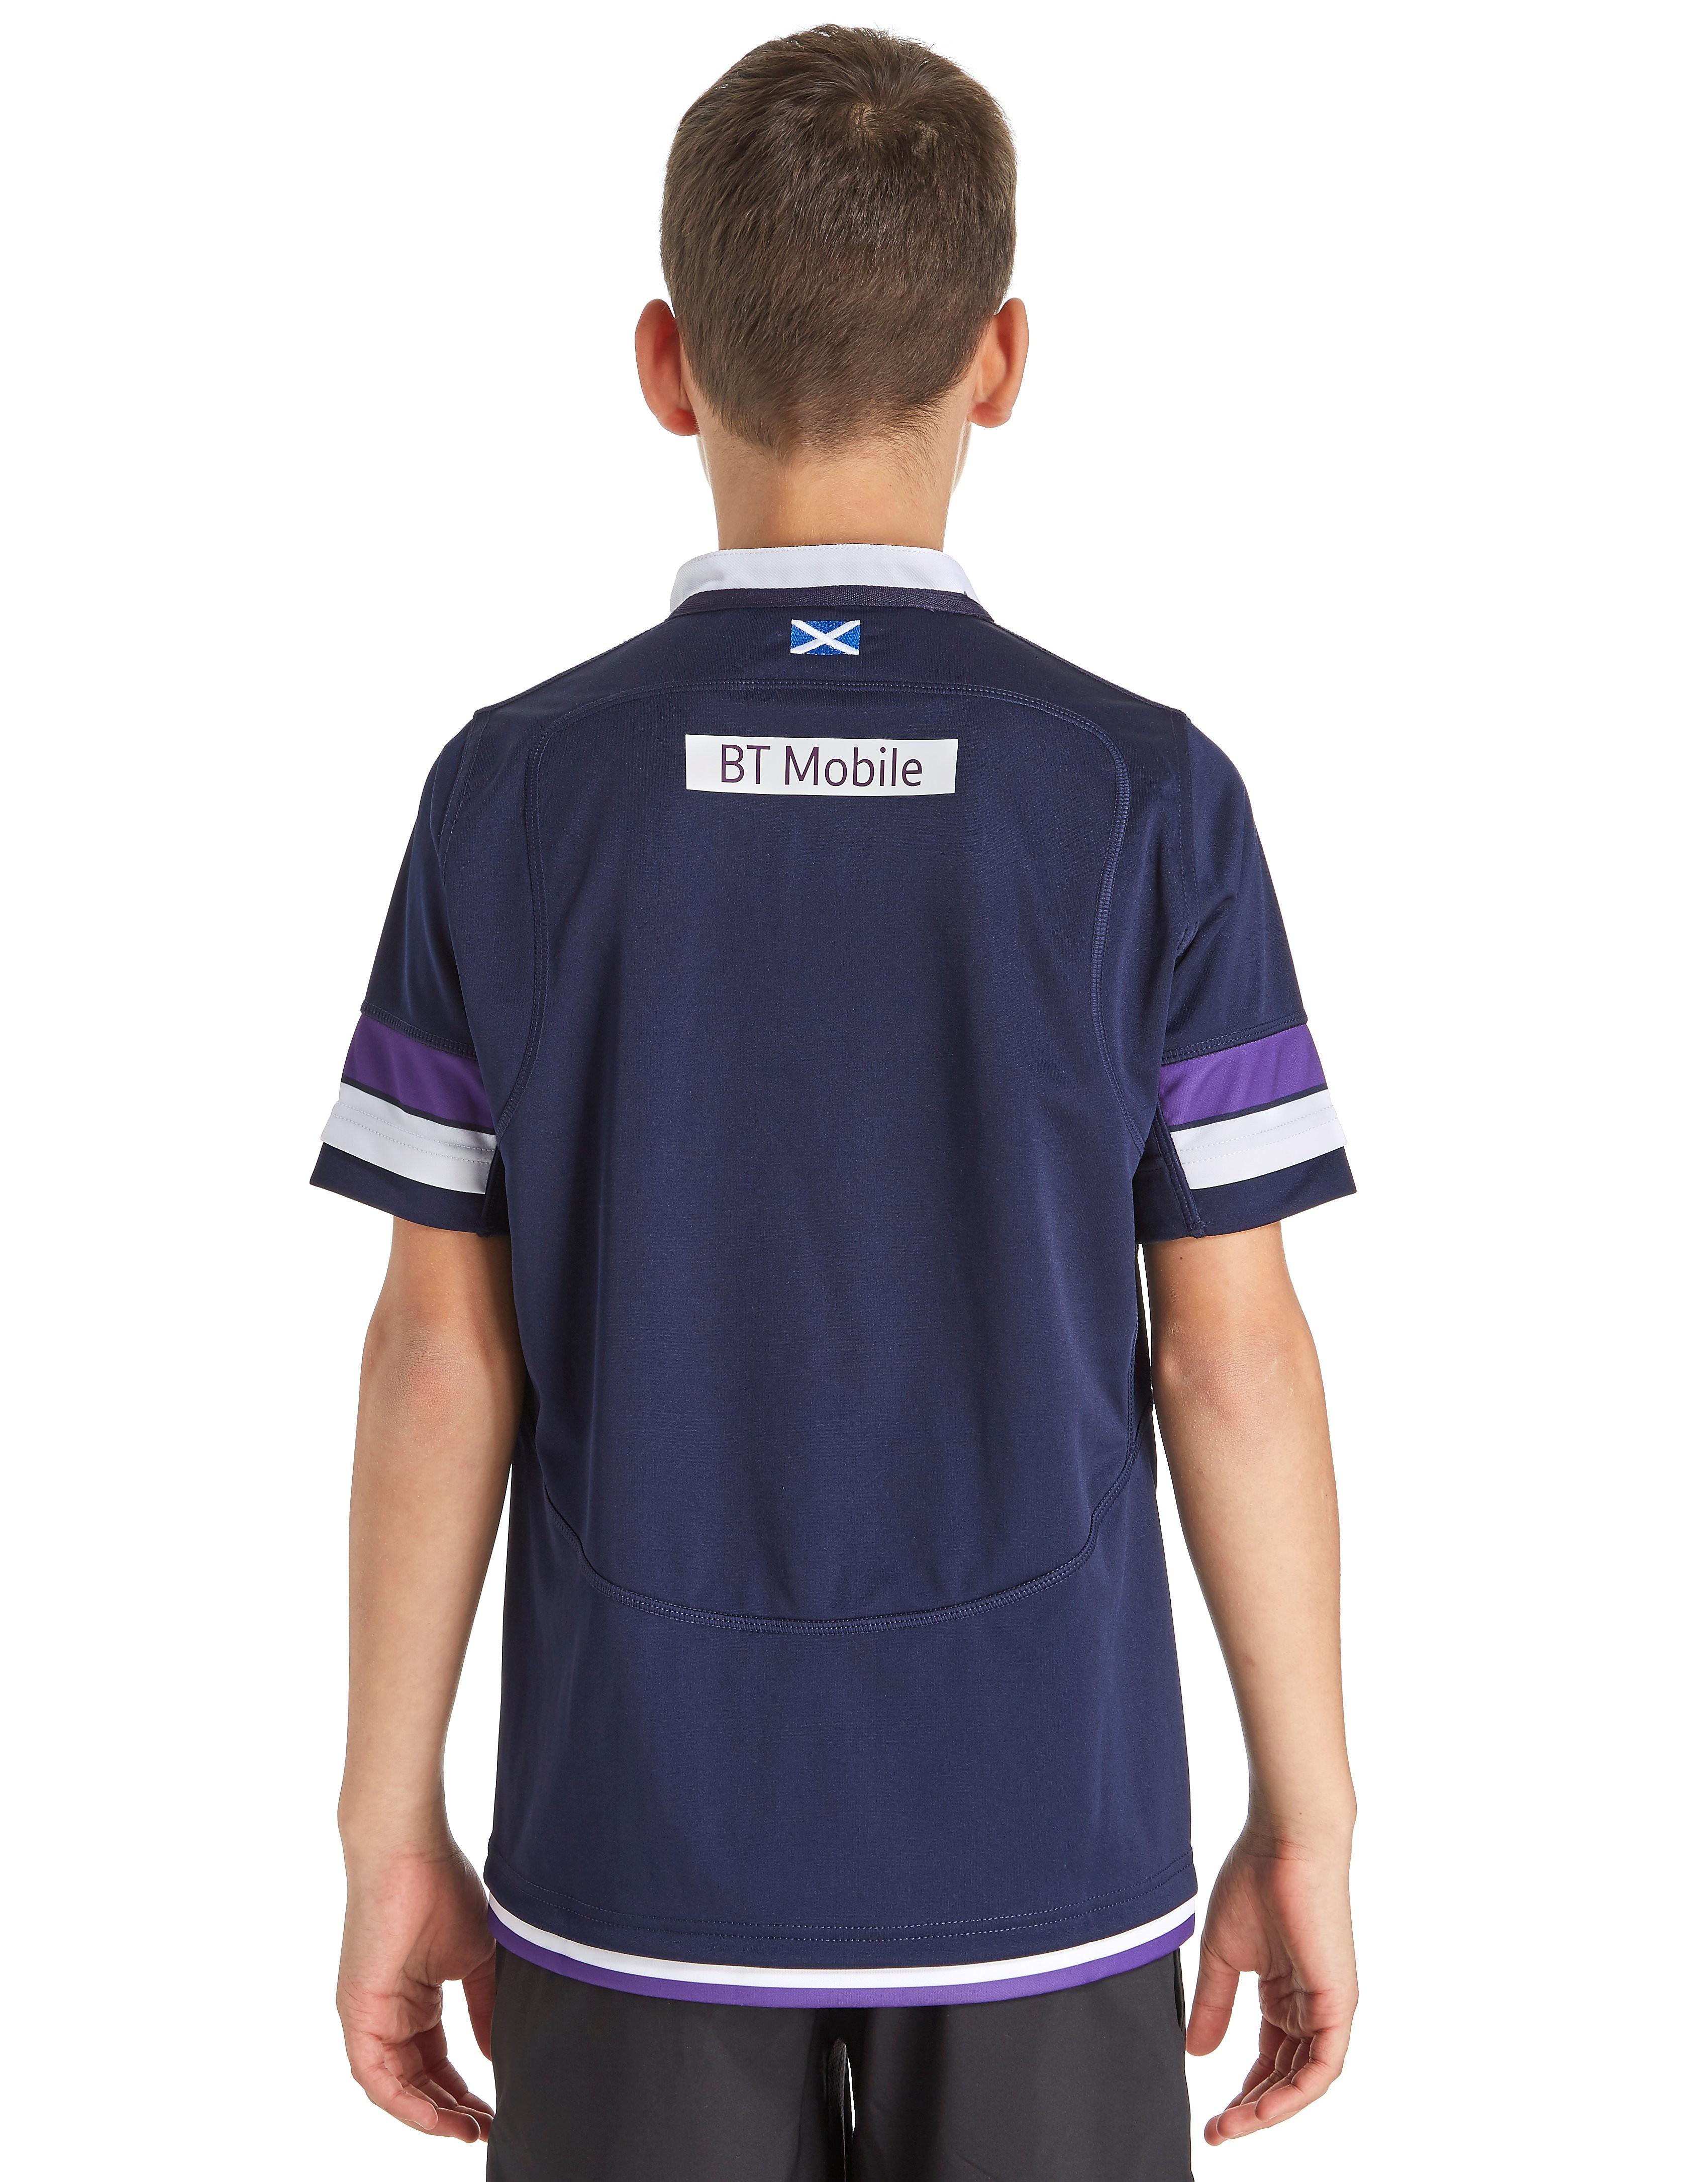 Macron Scotland Rugby Union Home Shirt 2017/18 Junior